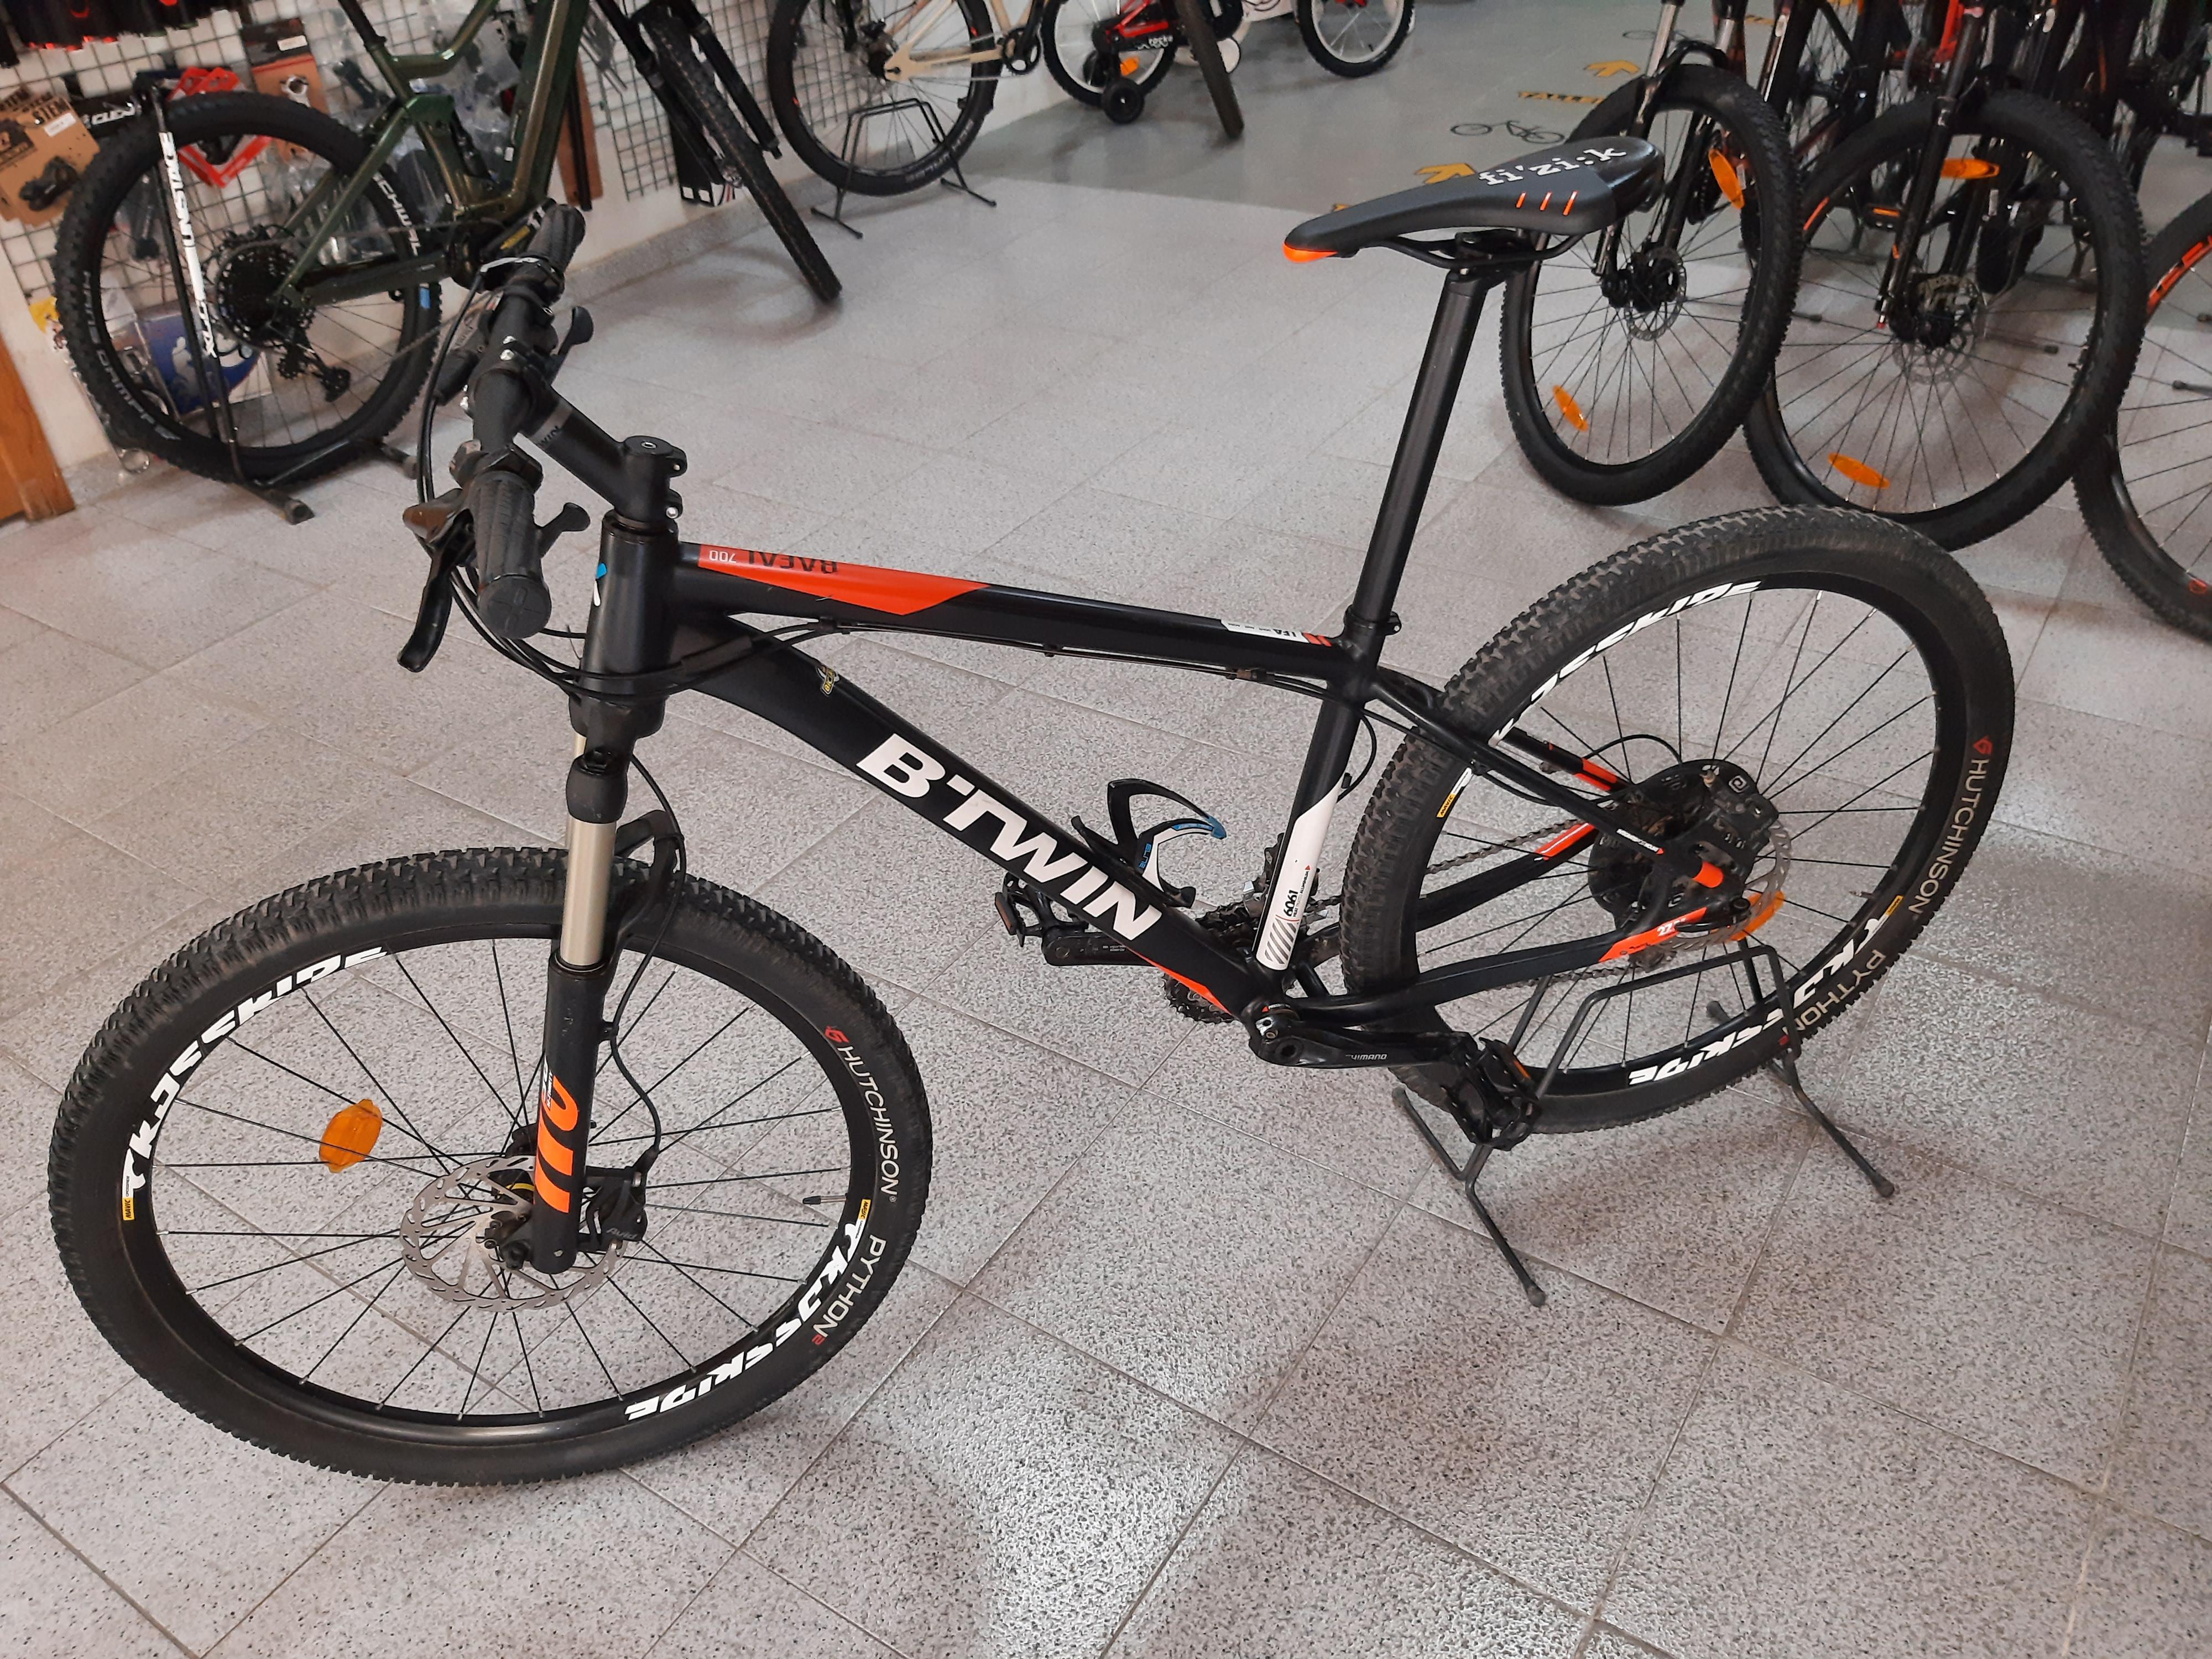 btwin-negra-naranja-rigida-3